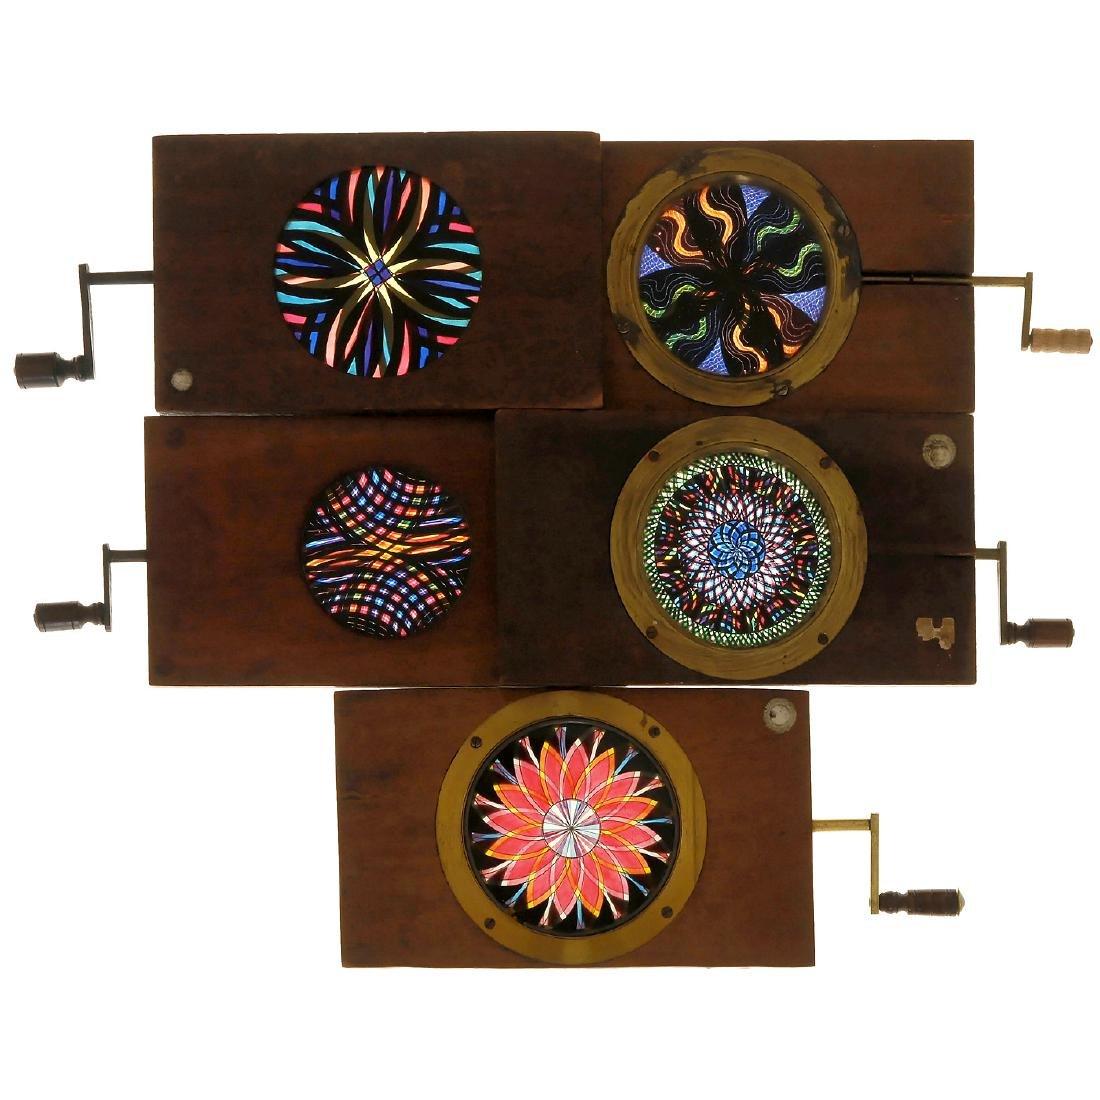 5 Magic Lantern Chromatropes, approx. 4 x 6 ½ in., c.